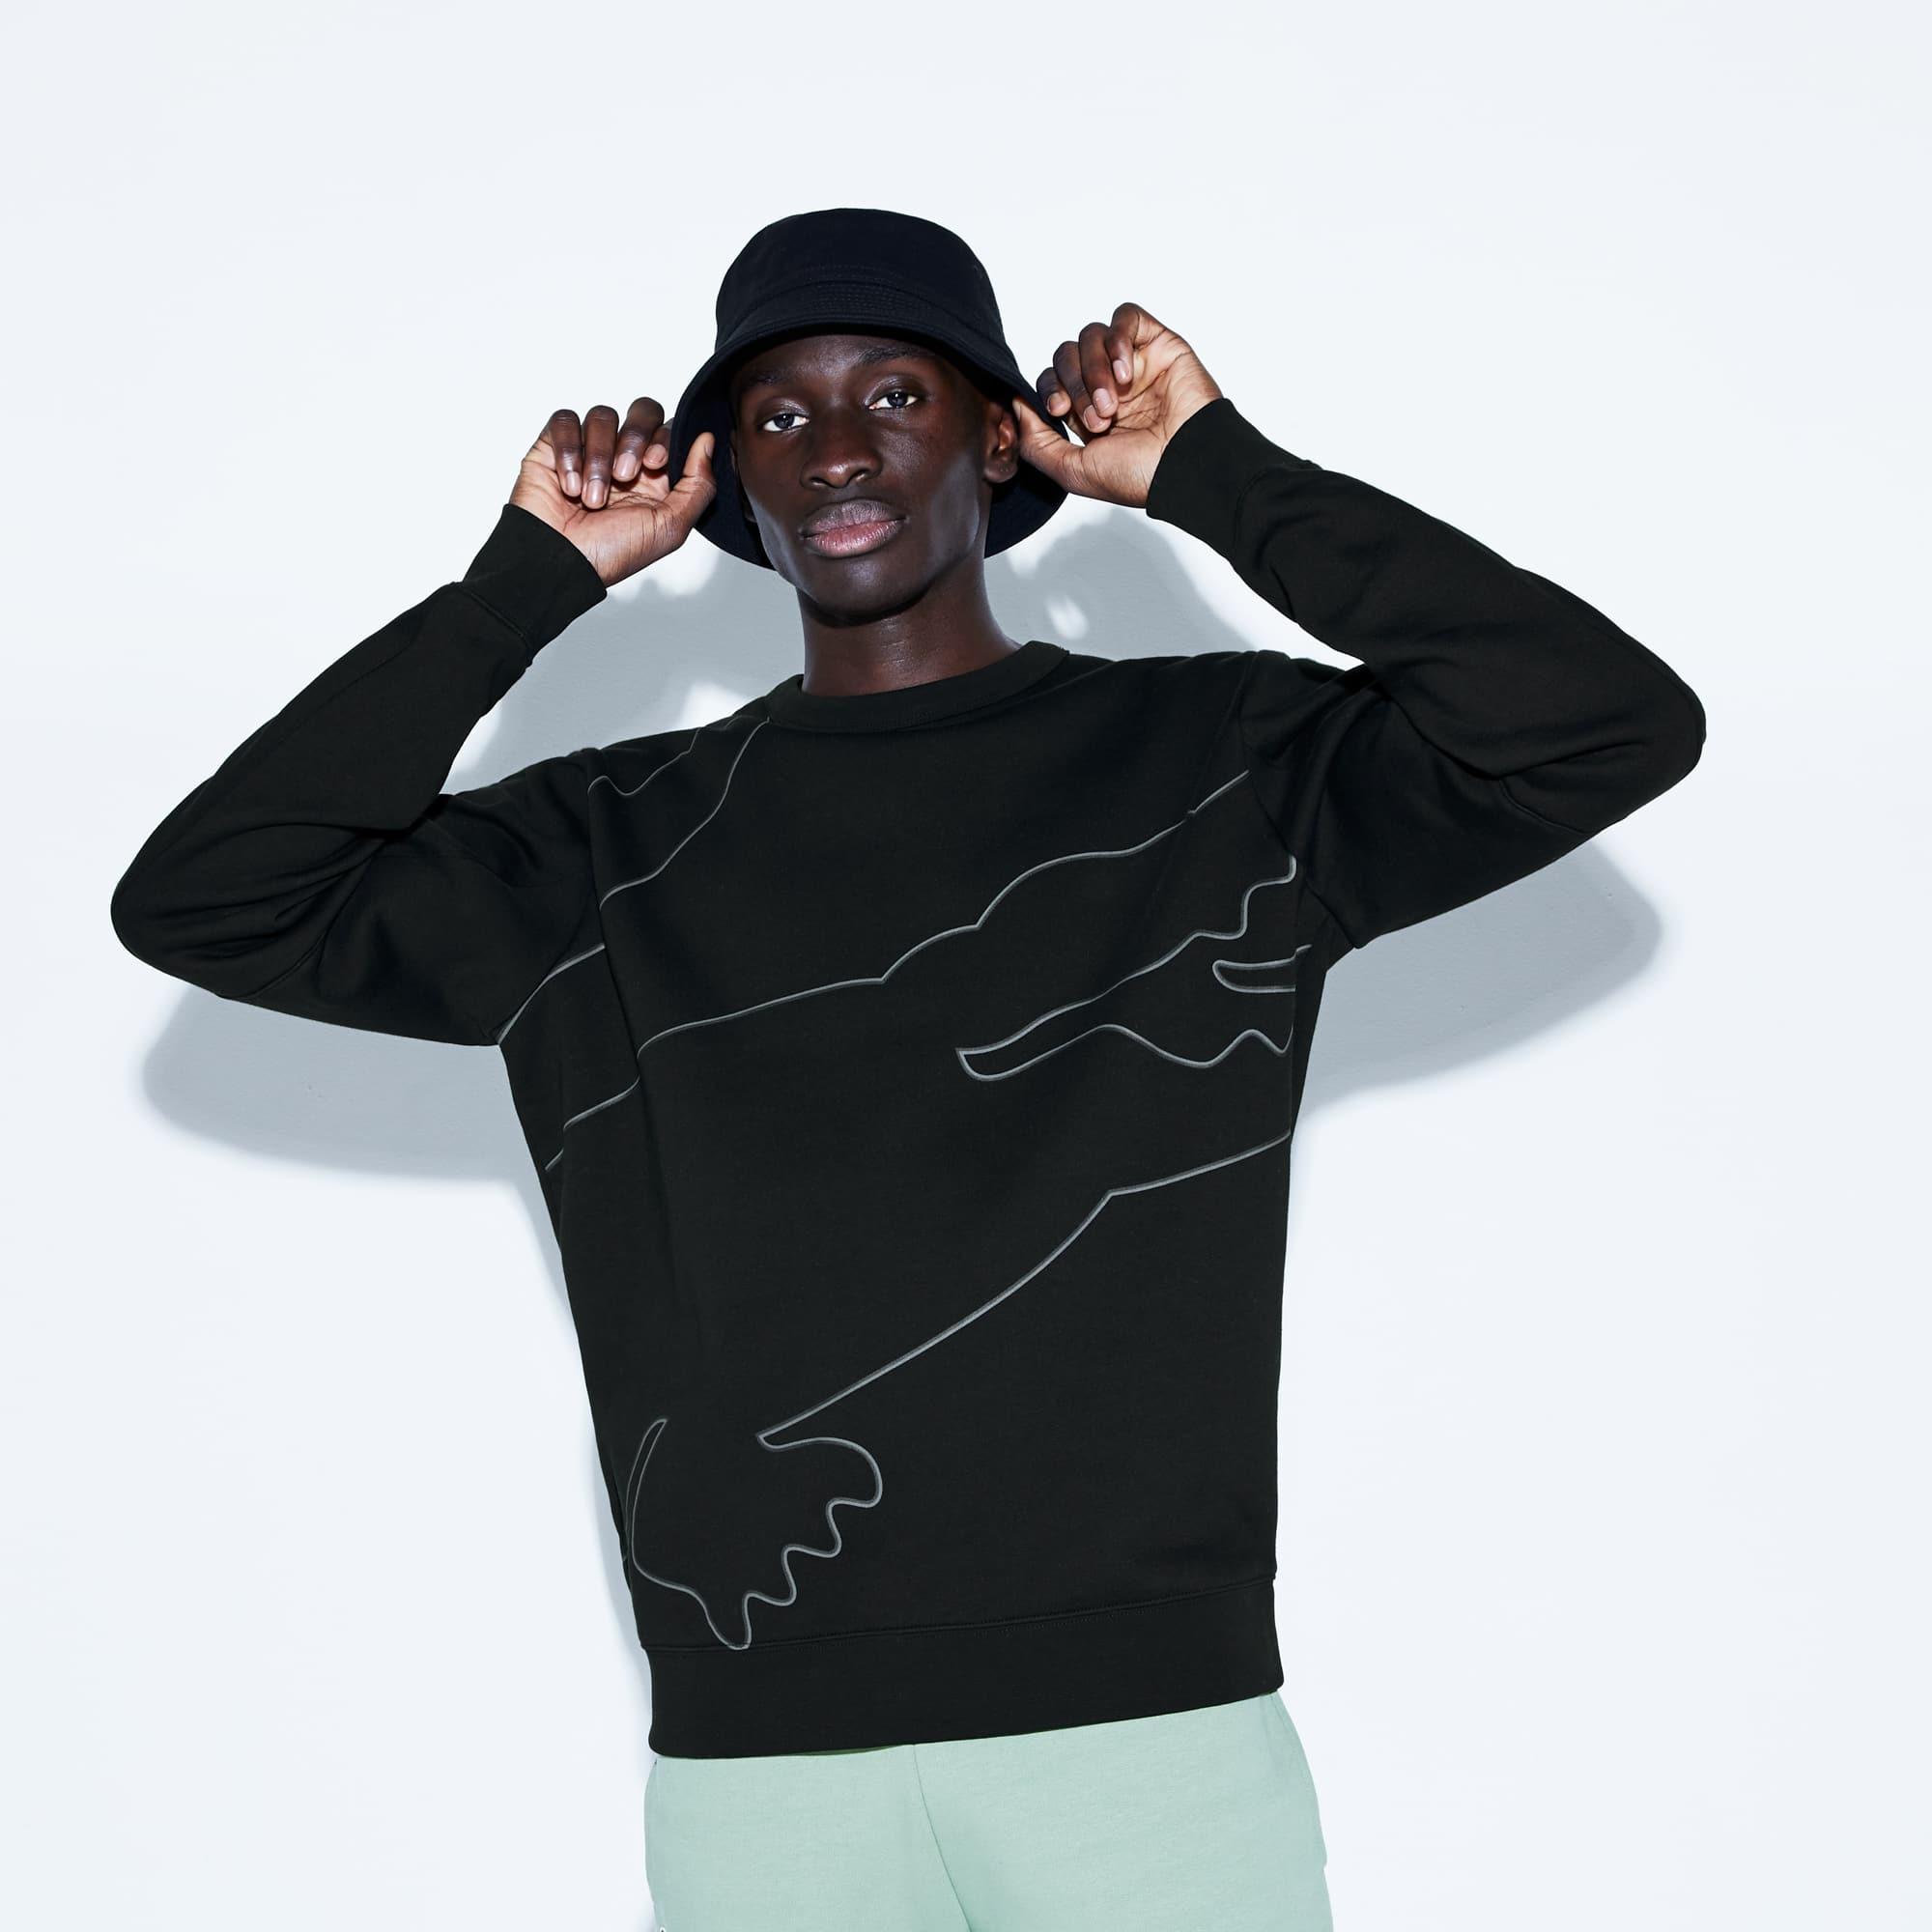 675cc2f7bf Sweatshirt Lacoste SPORT en molleton gratté avec maxi croco | LACOSTE